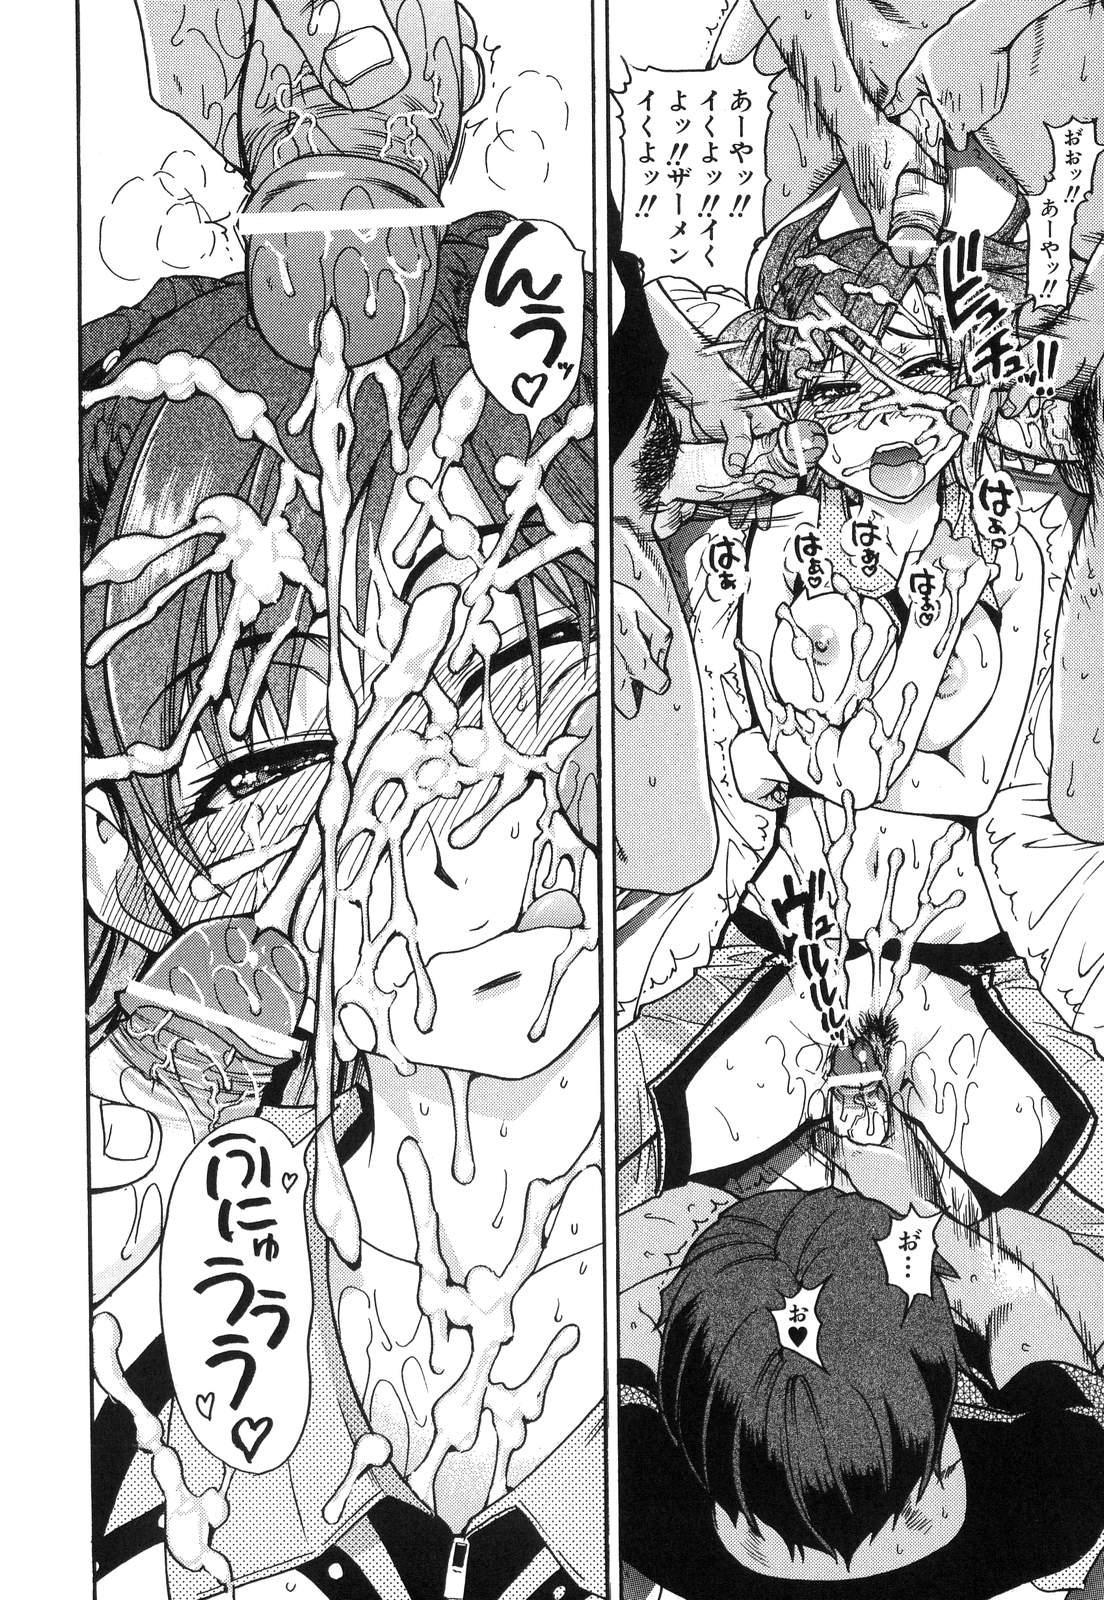 Shining Musume. 6. Rainbow Six 62